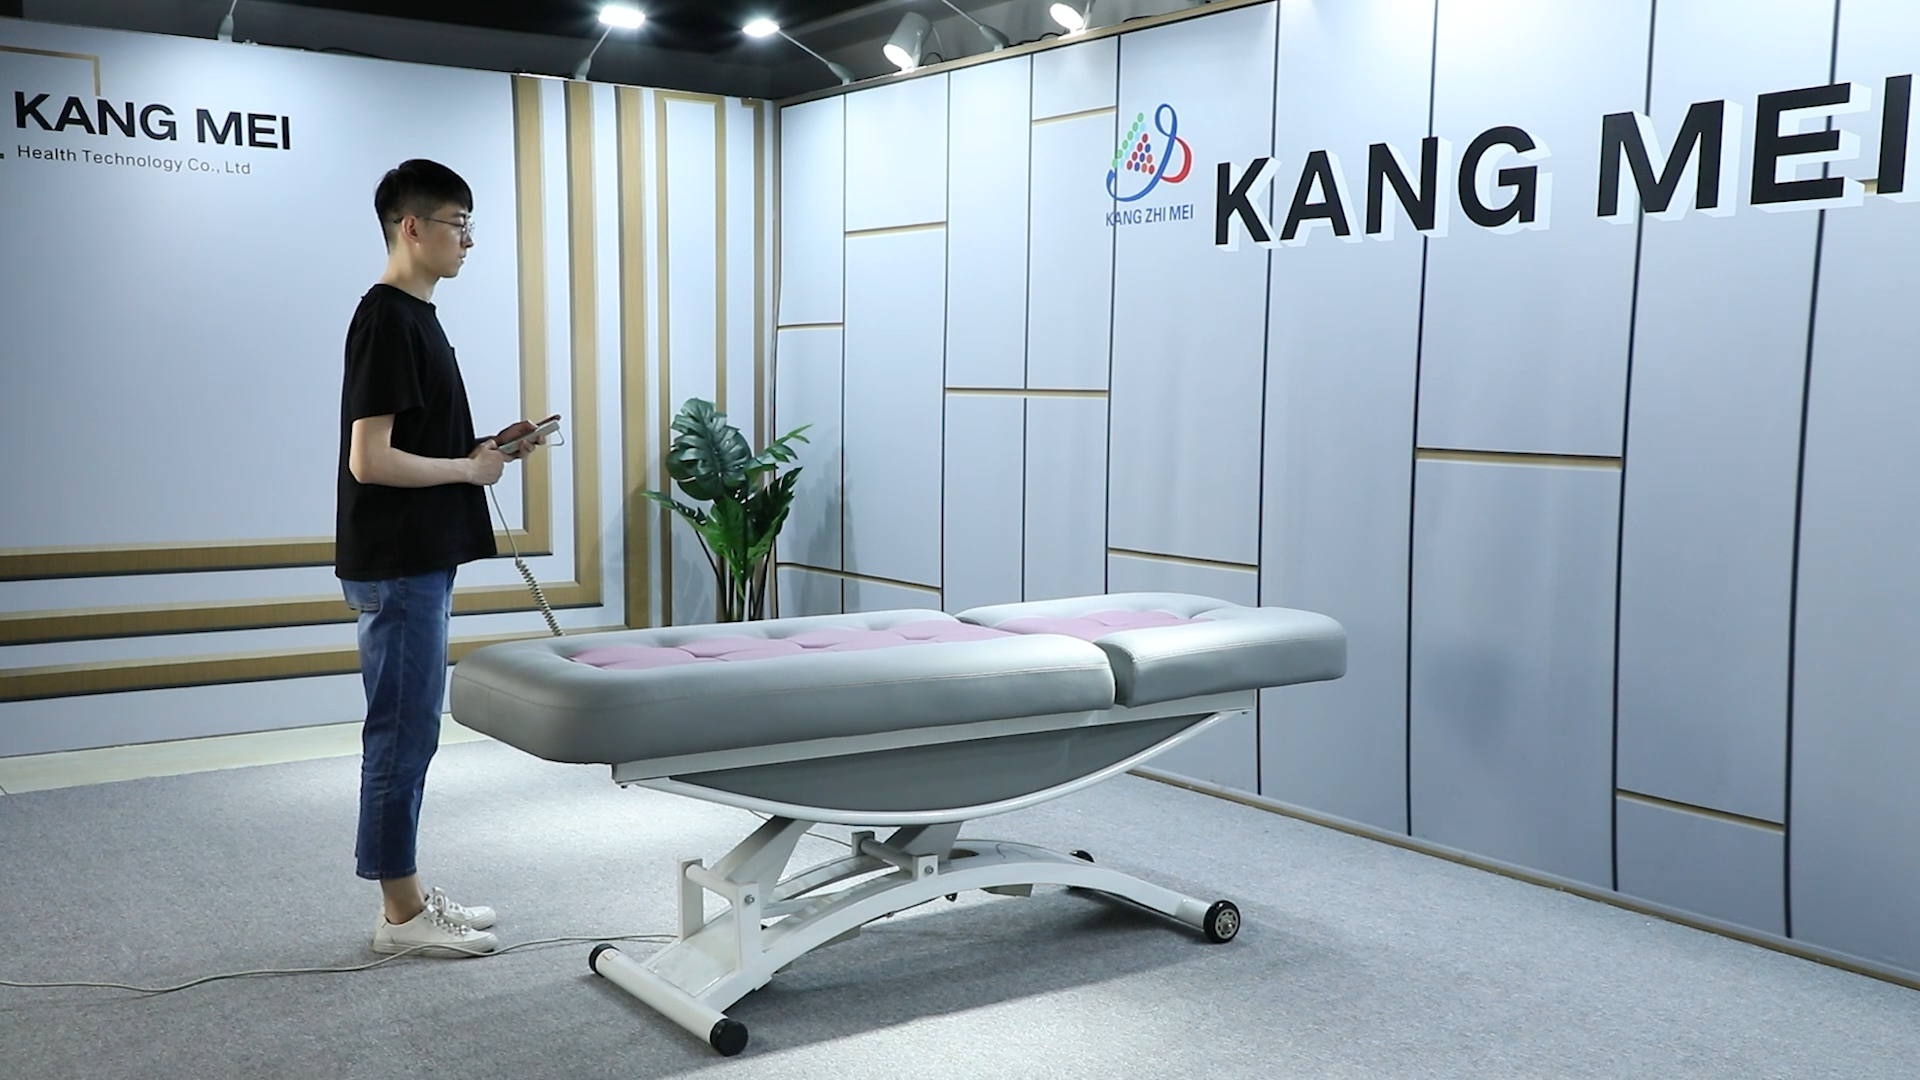 Kangmei सबसे अच्छी कीमत 2 इलेक्ट्रिक सीई मोटर्स स्पा सैलून कॉस्मेटिक सौंदर्य मालिश की मेज उपचार चेहरे बिस्तर